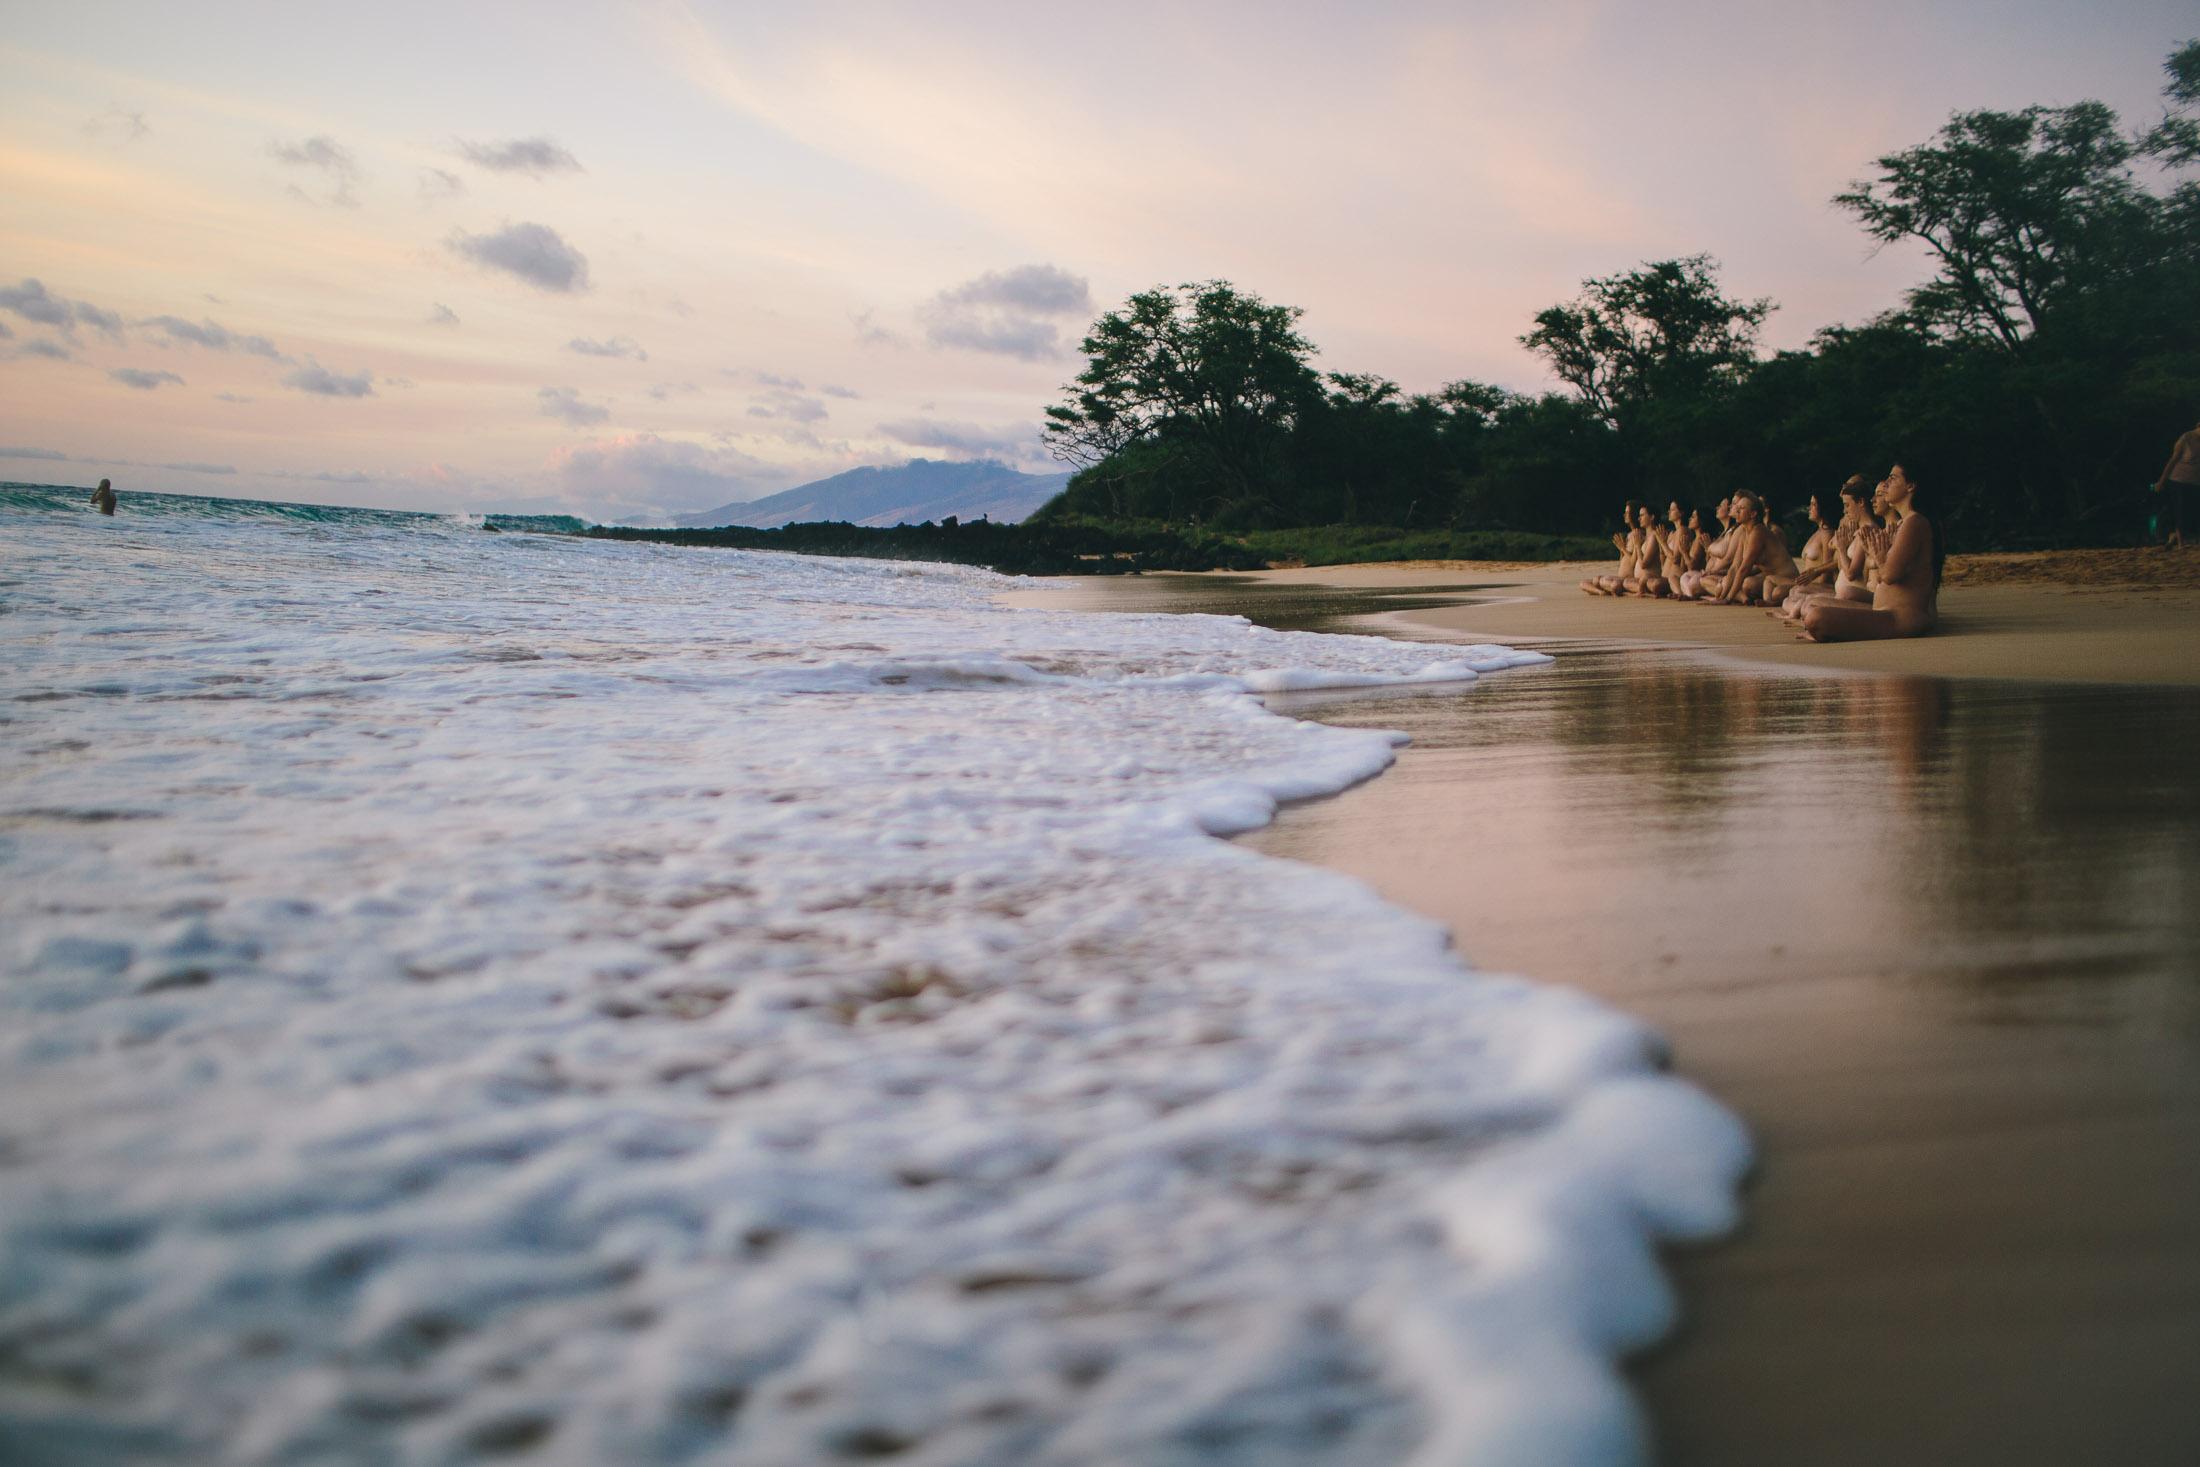 little beach photography during a beautiful sunset